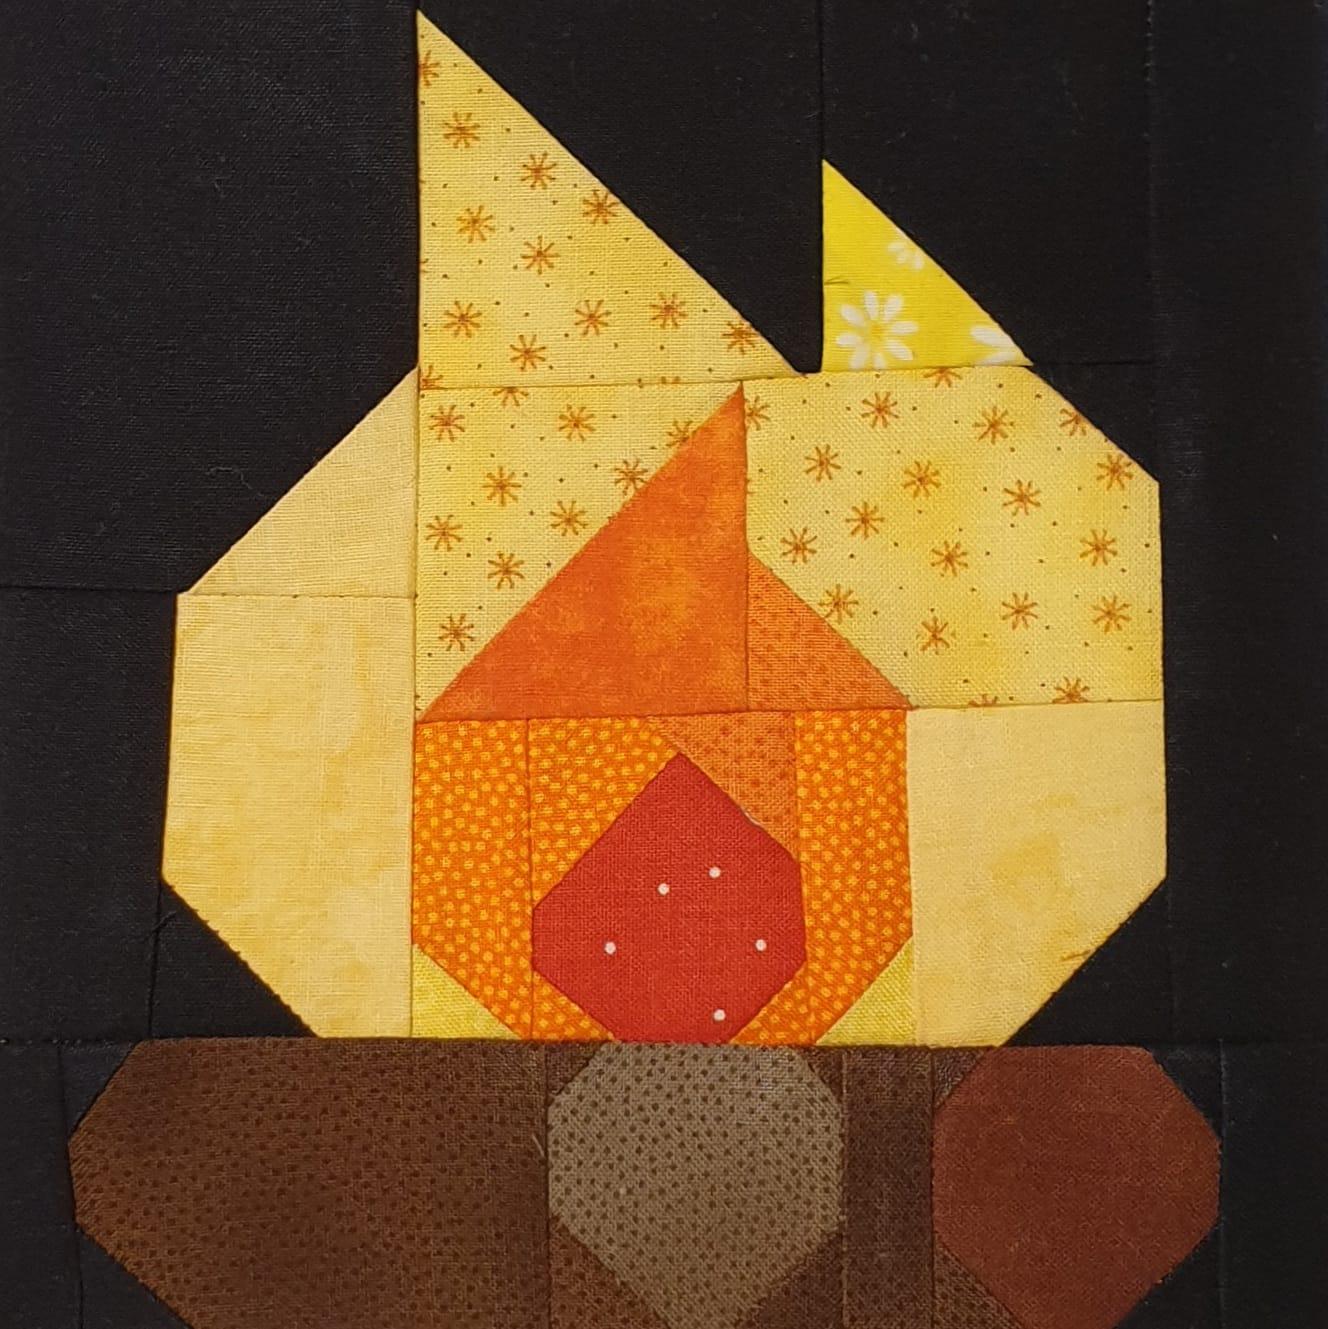 Campfire quilt pattern - Camping quilt patterns